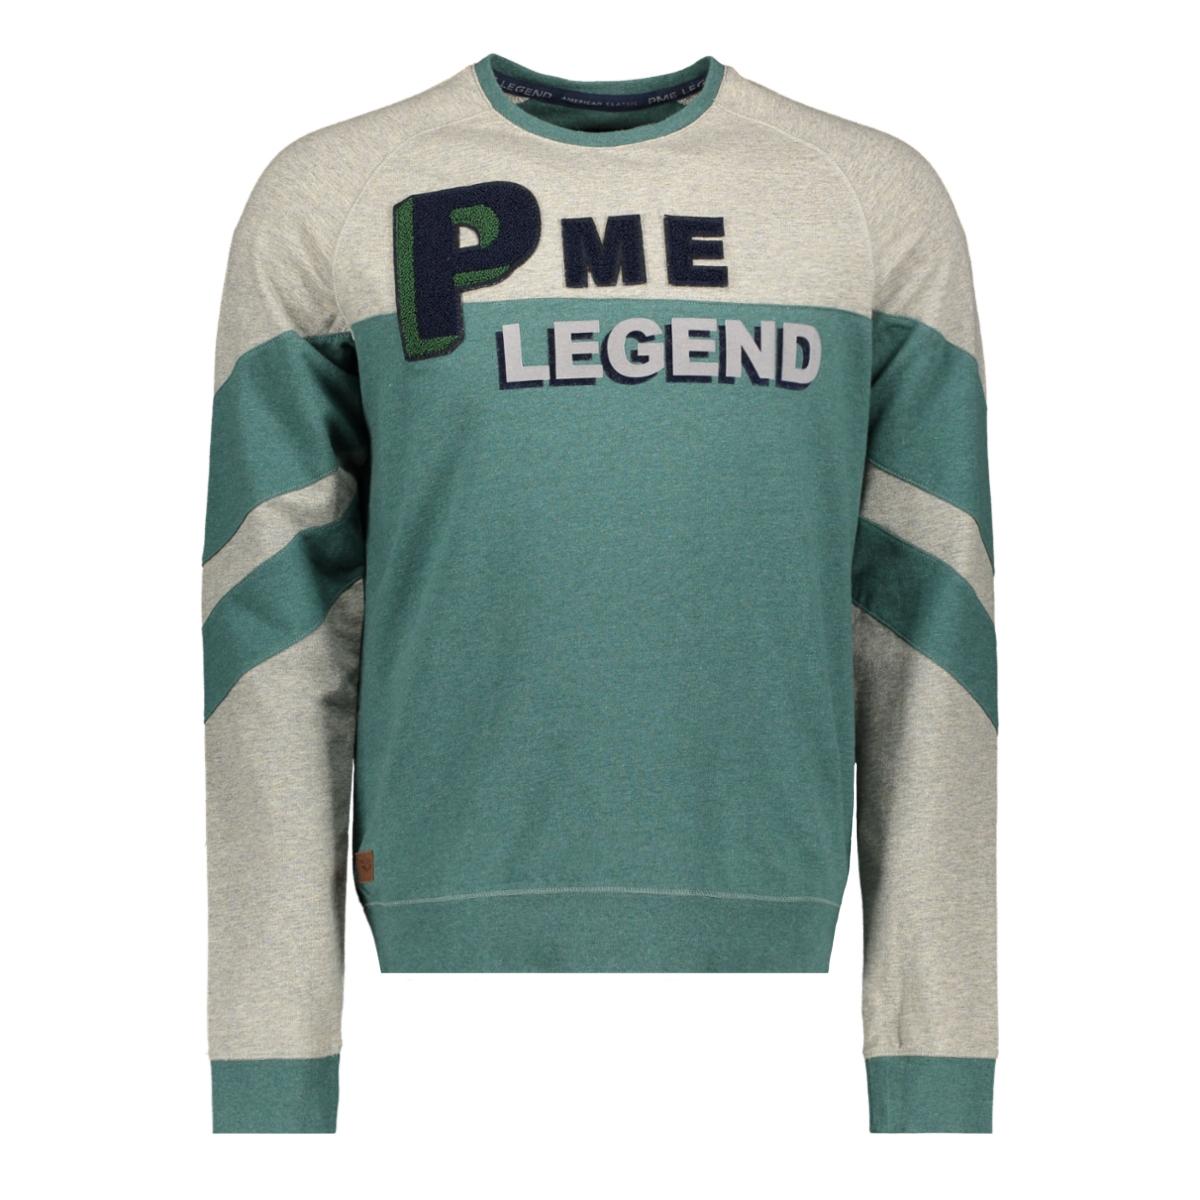 pts191505 pme legend t-shirt 6082